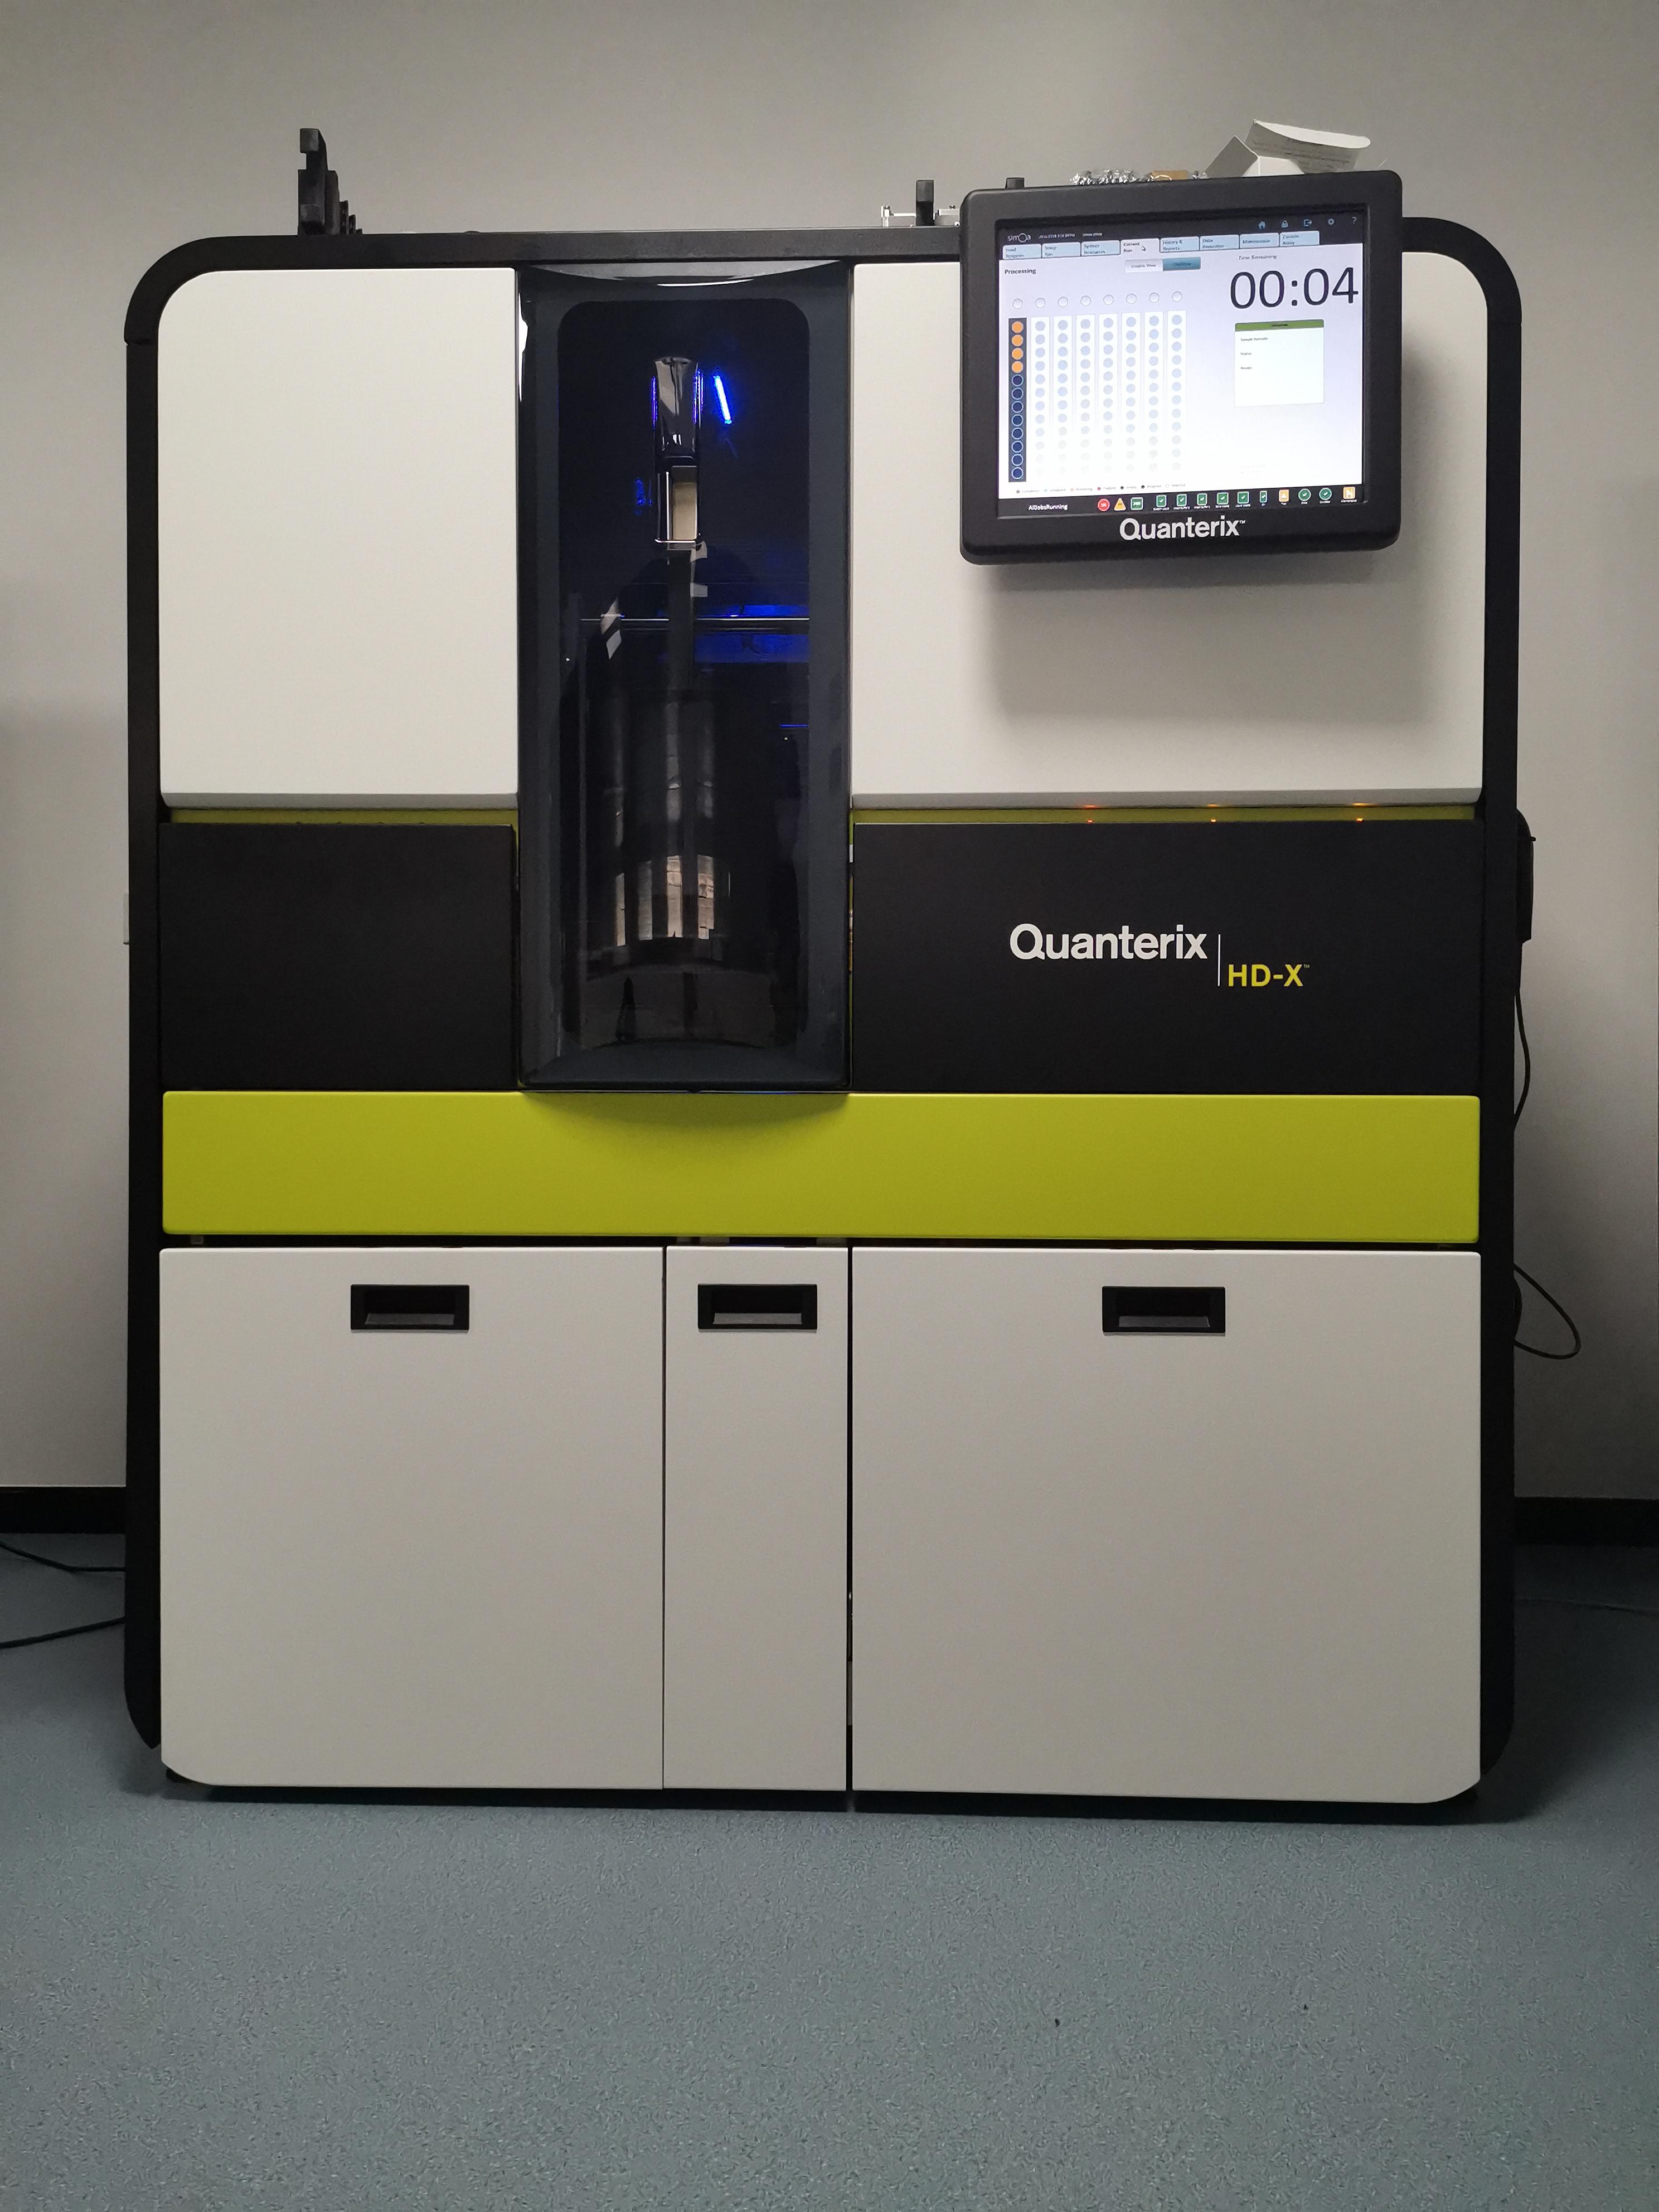 Simoa HD-X 数字式单分子免疫阵列分析仪